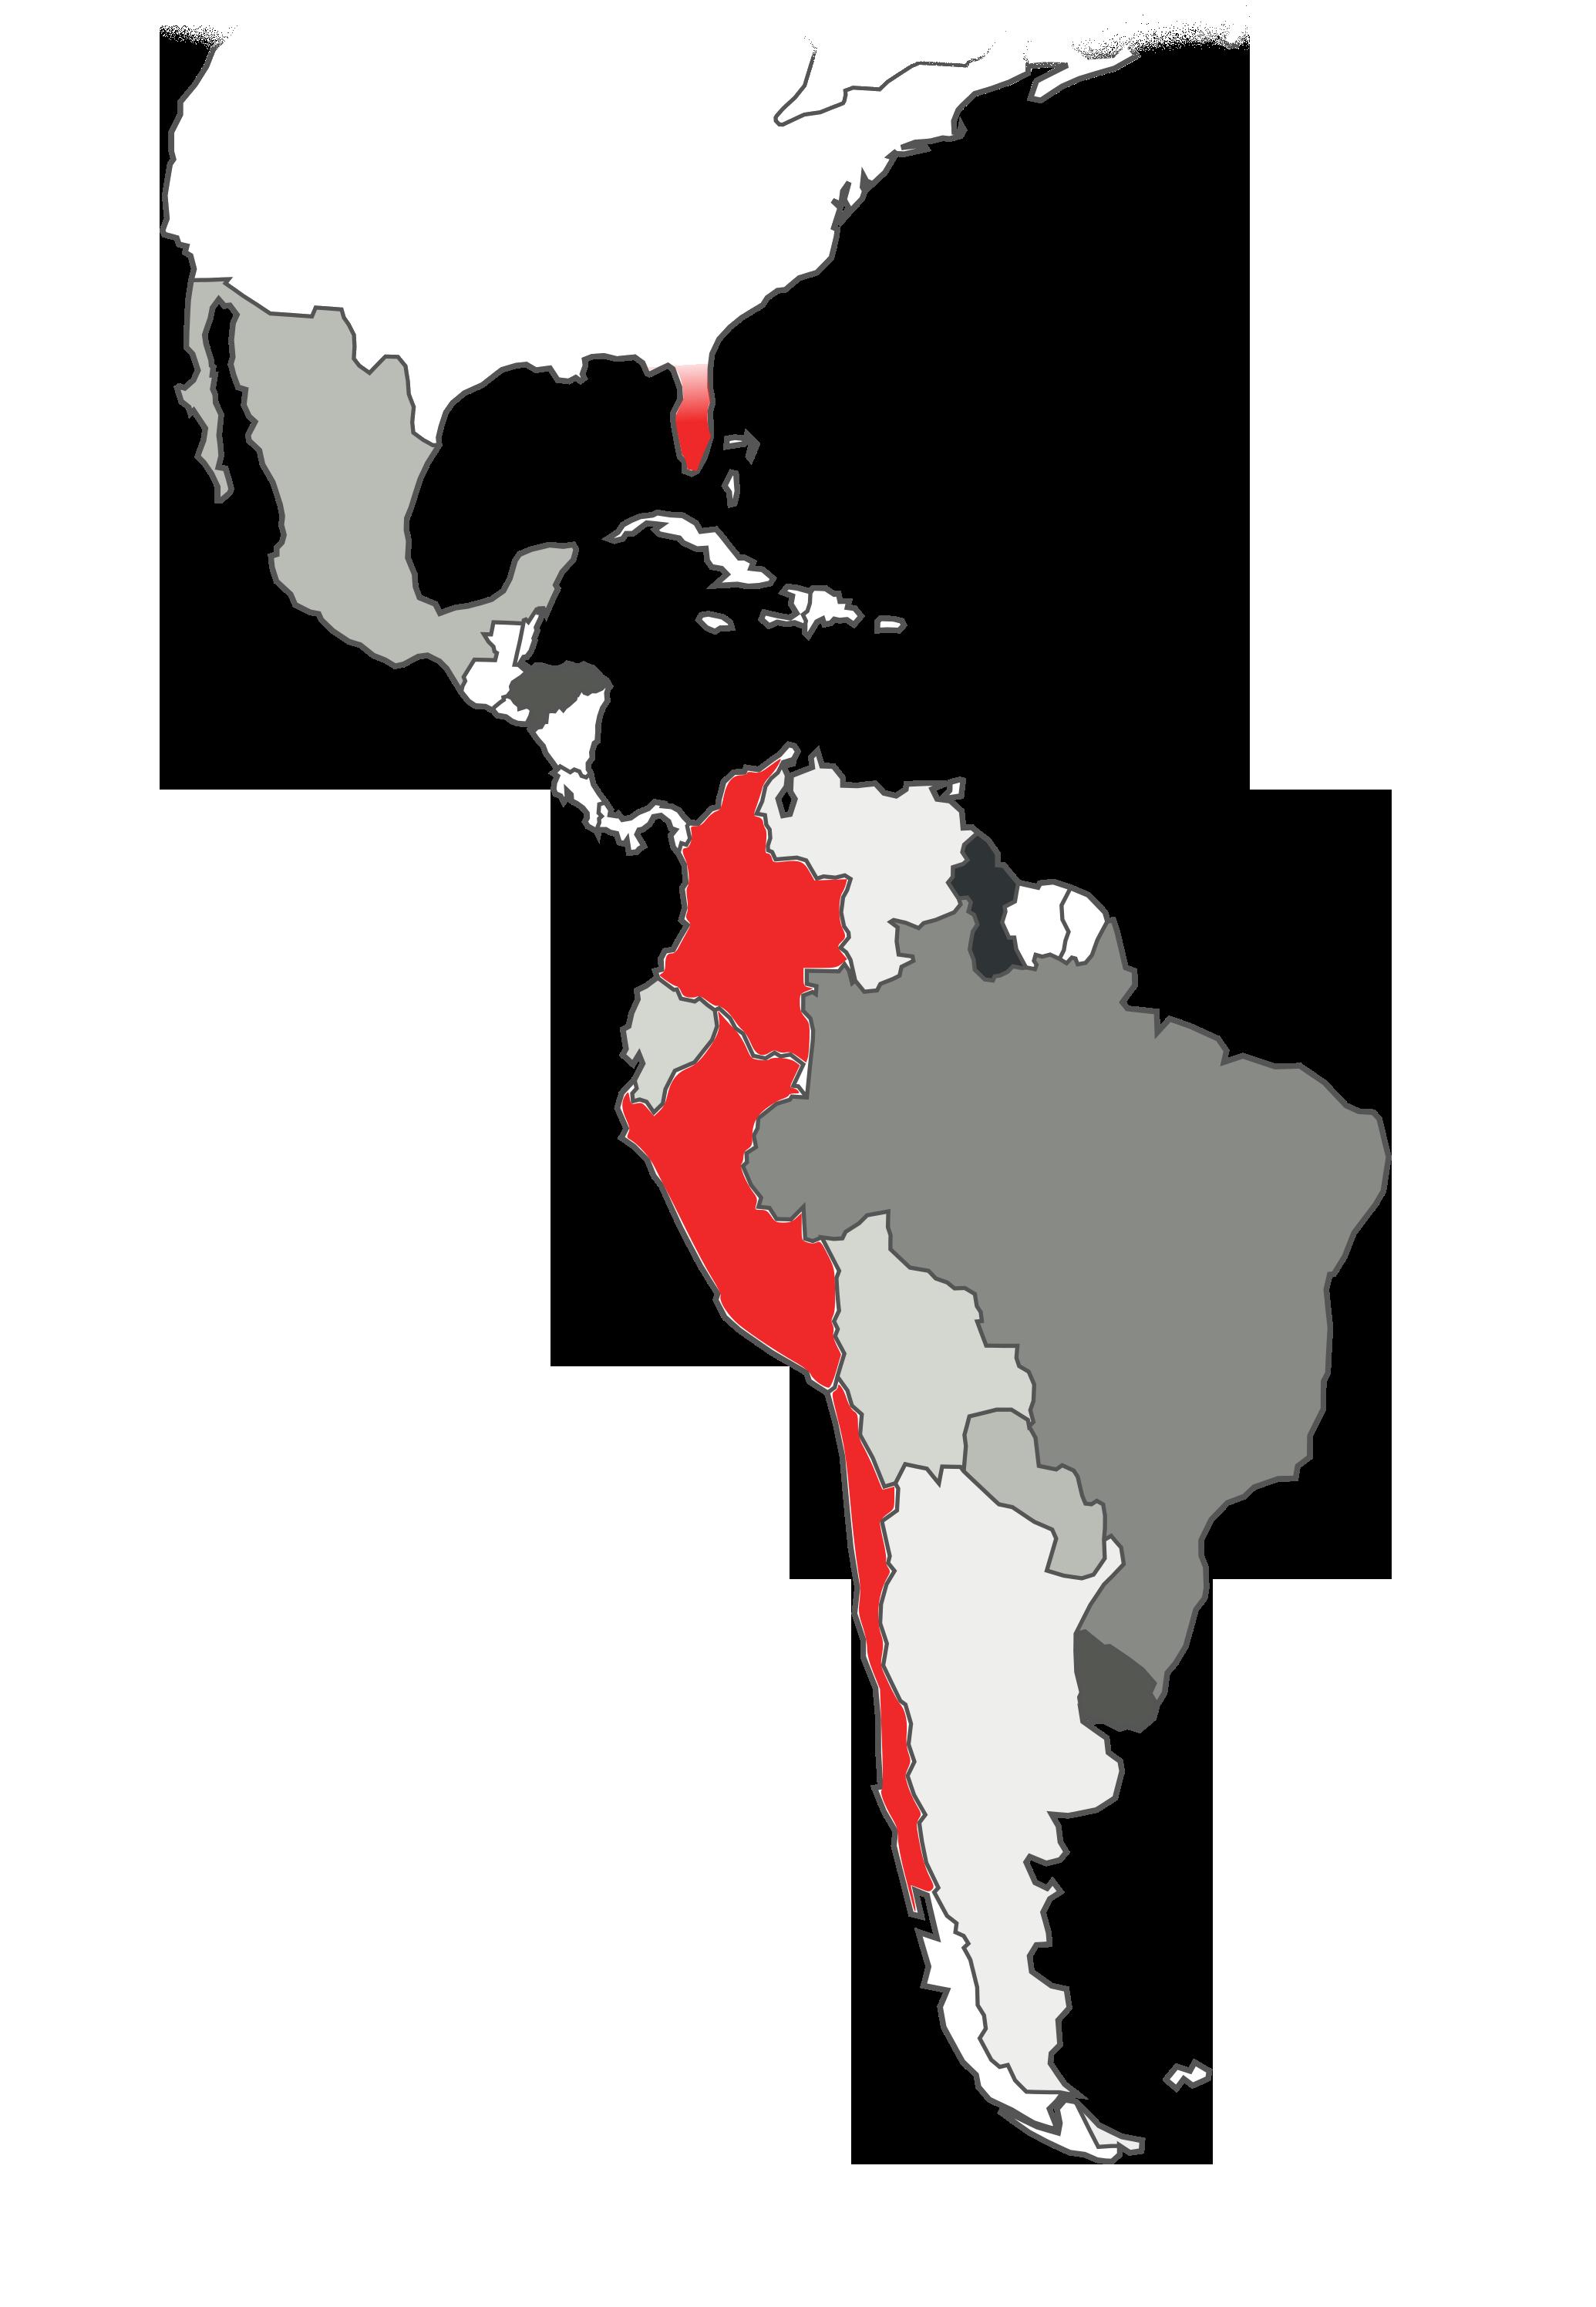 Mapa con sedes 3HTP